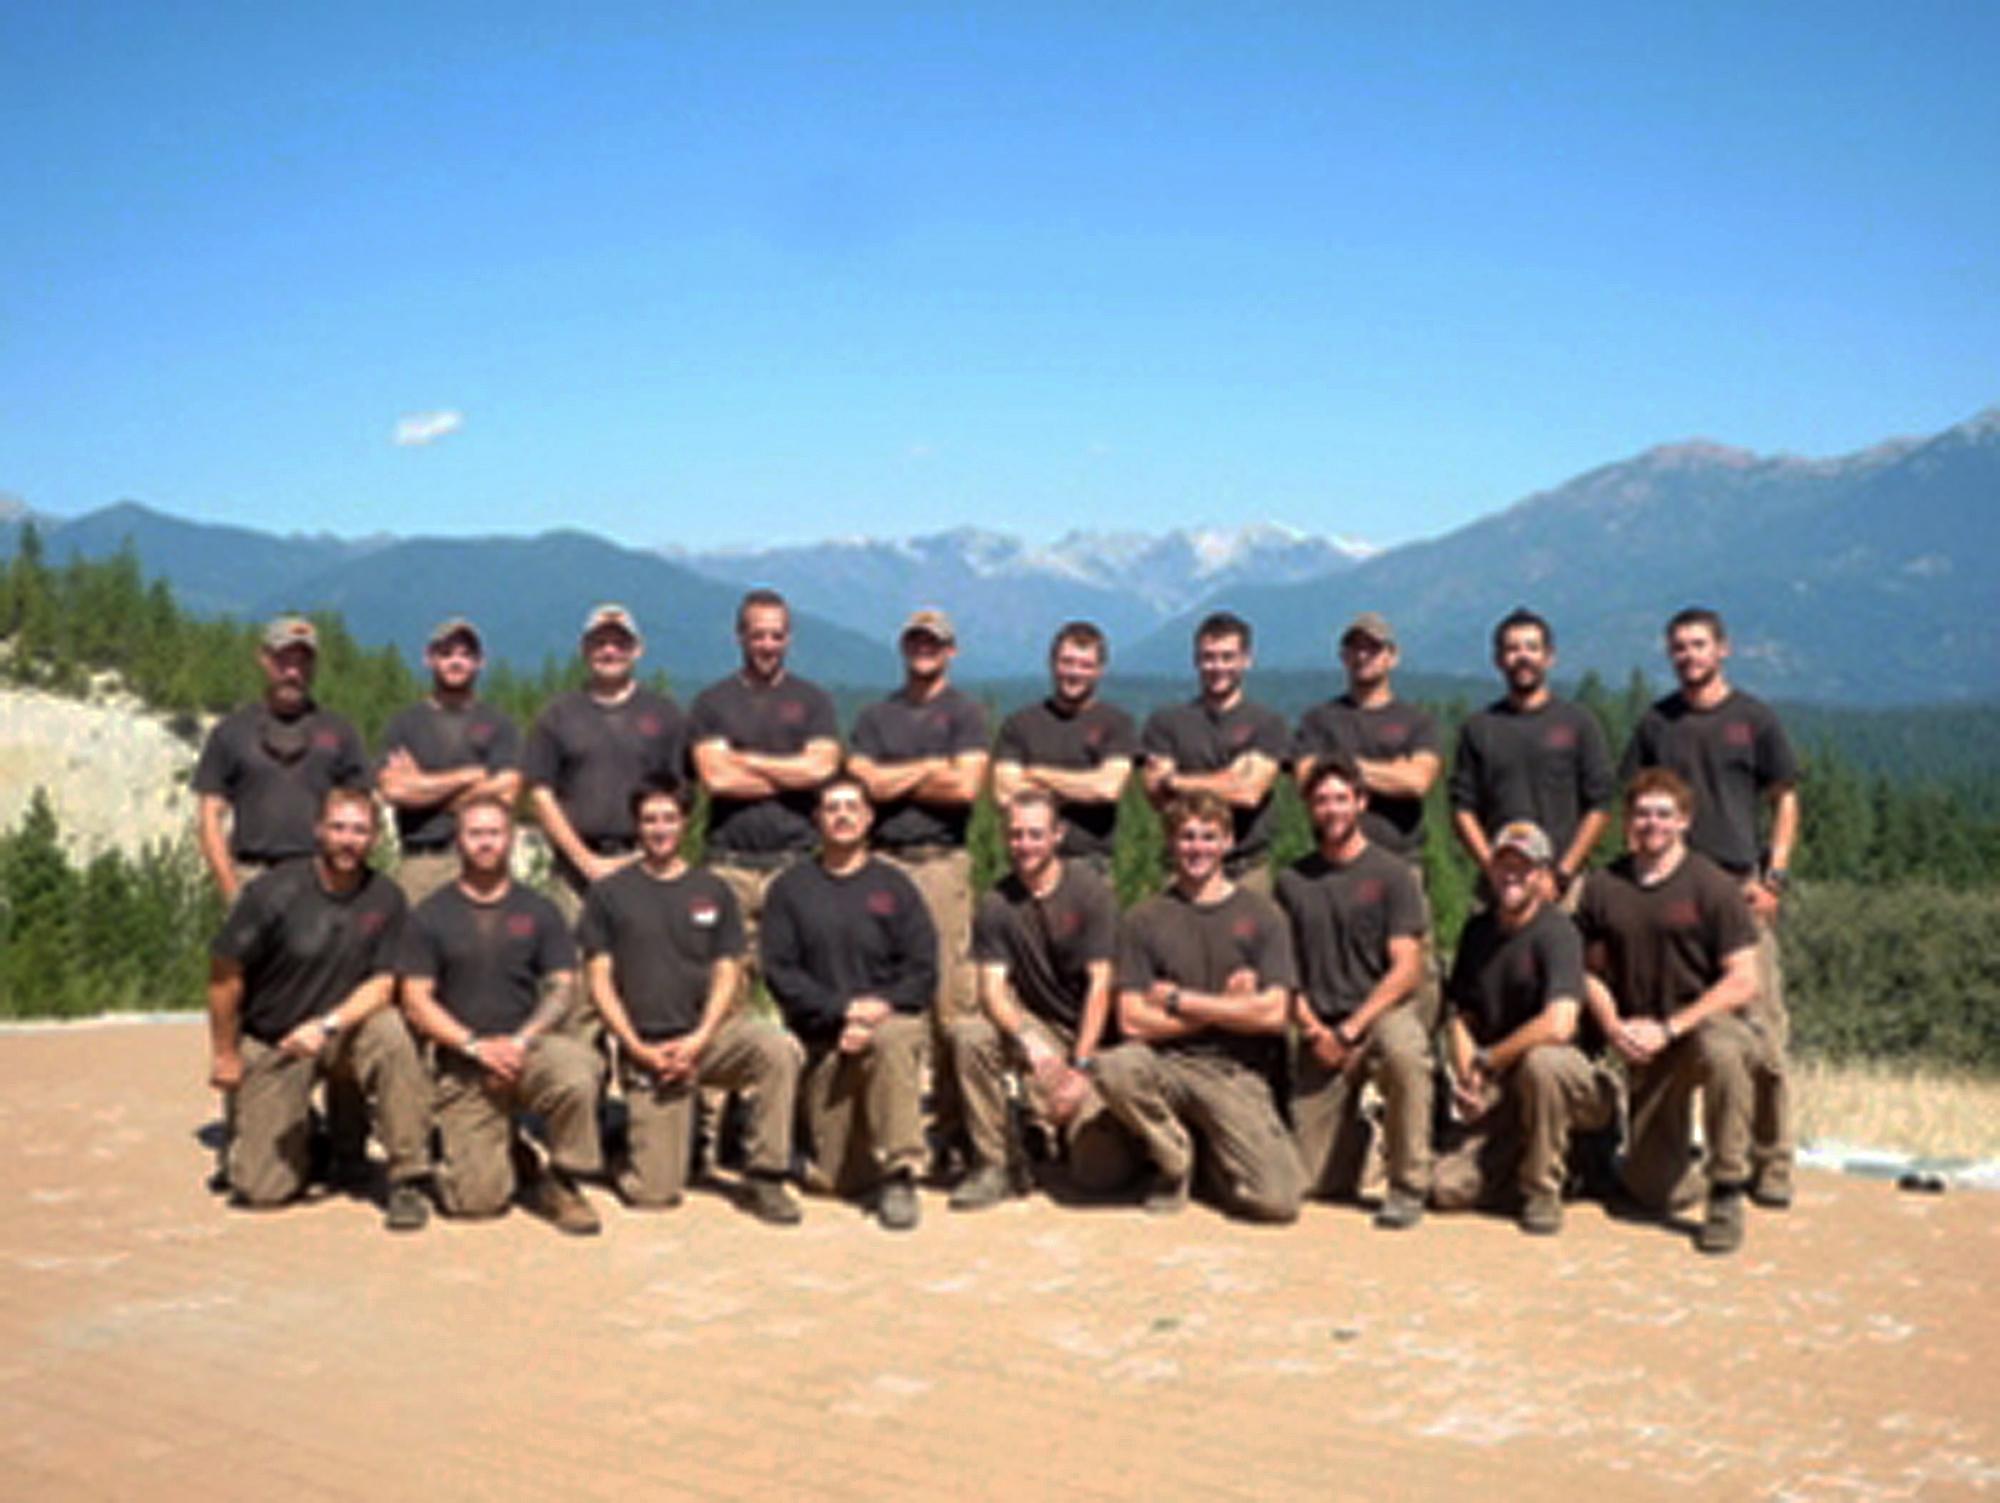 Arizona yavapai county yarnell - Lone Survivor Honors 19 Brothers At Arizona Firefighters Memorial Nbc Southern California